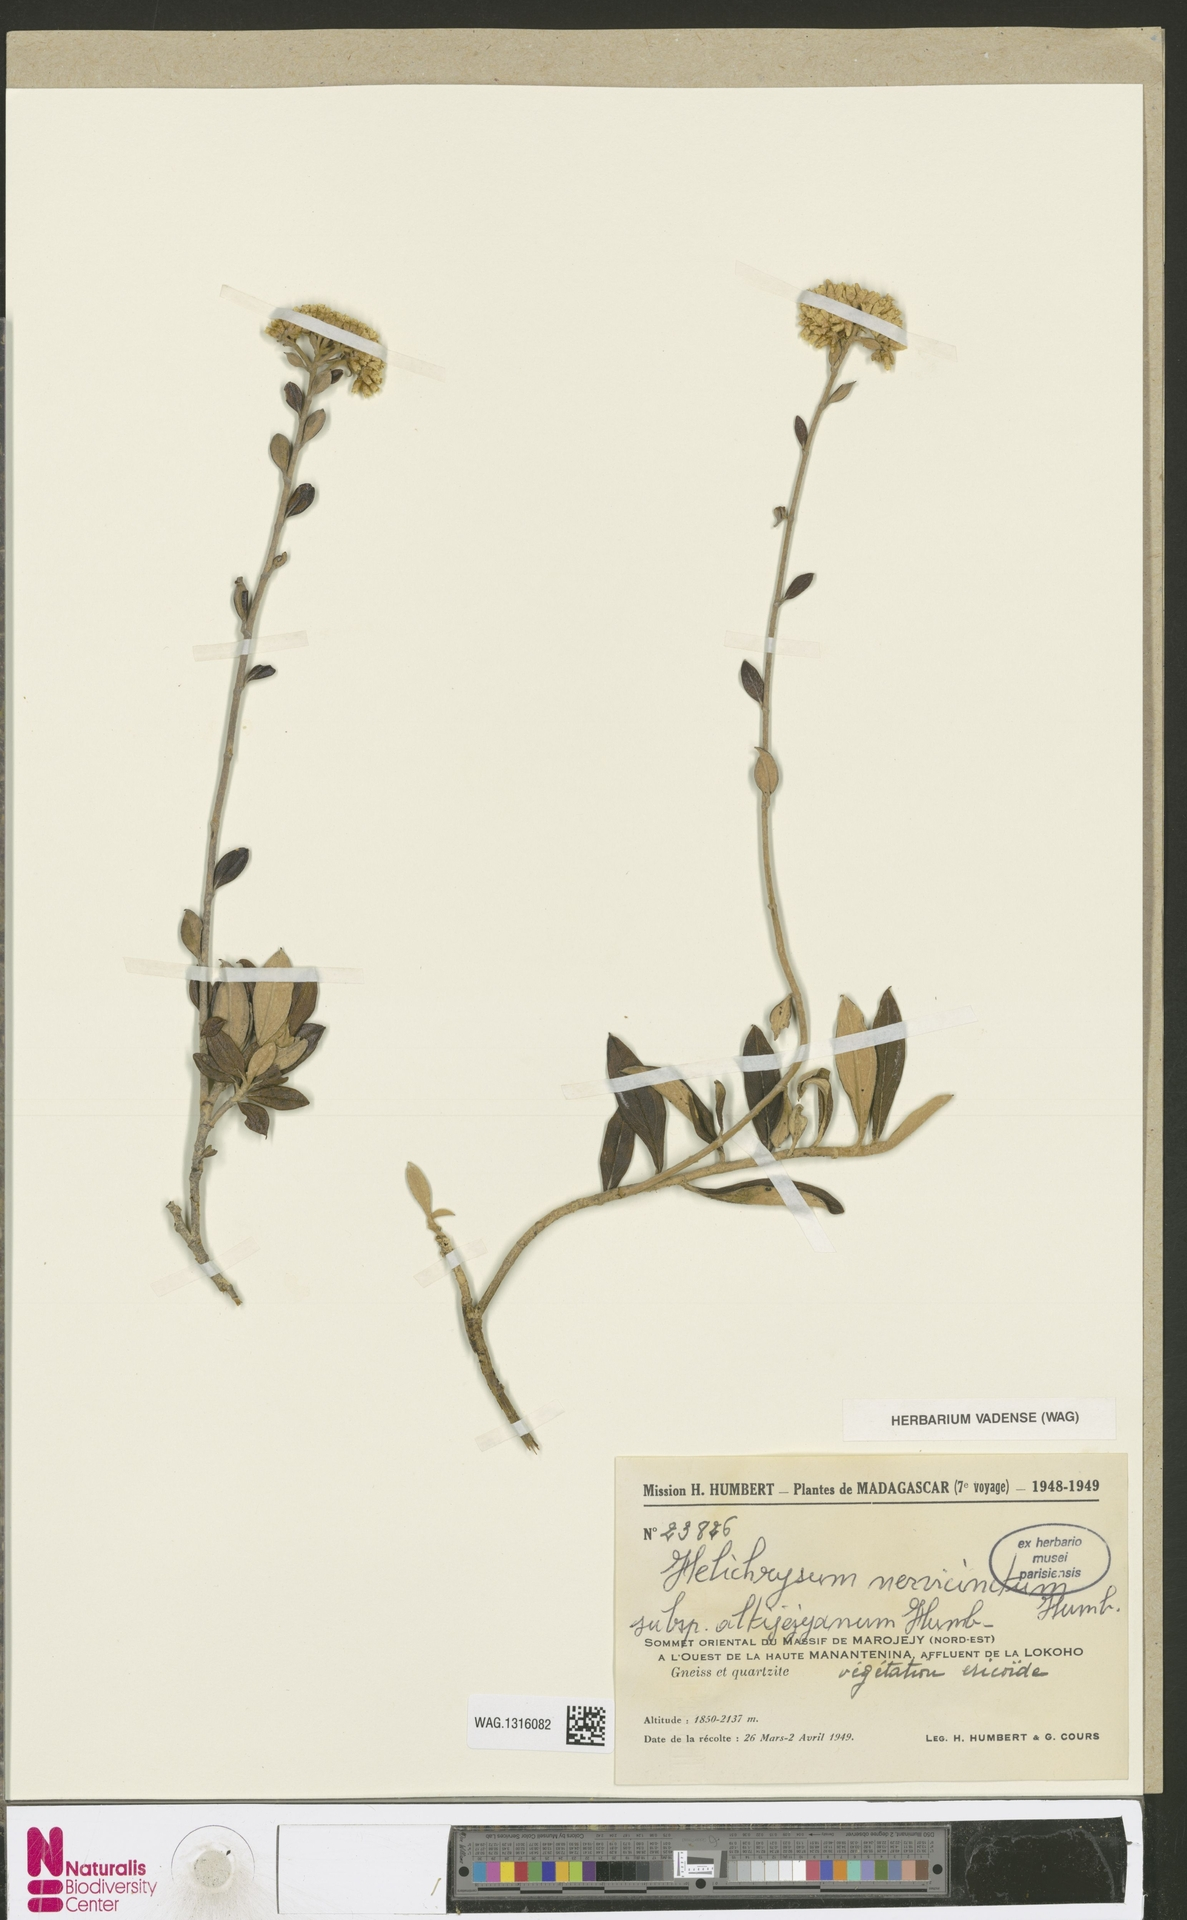 WAG.1316082 | Helichrysum nervicinctum subsp. altijejyanum Humbert